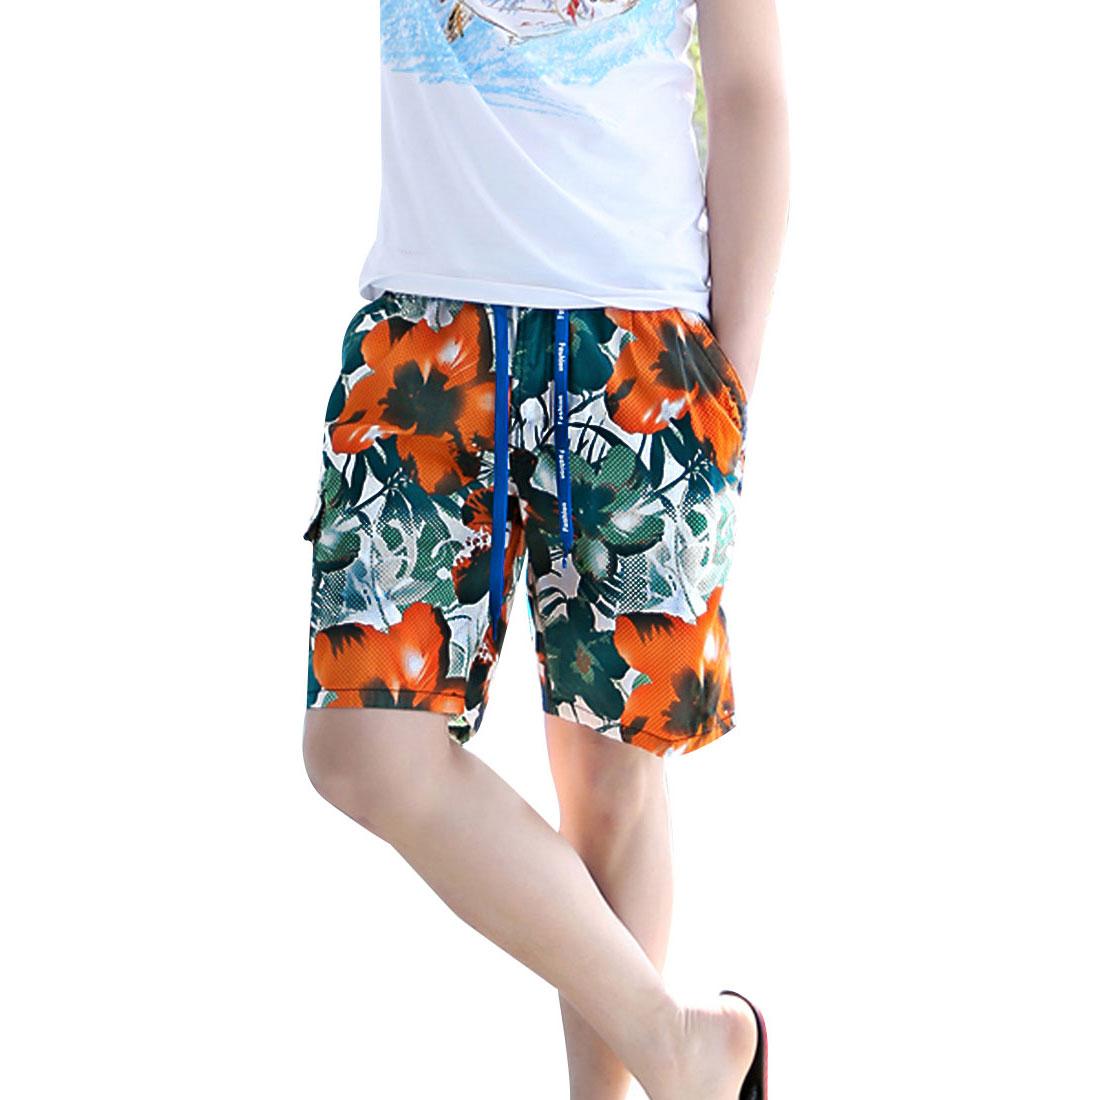 Mens Teal Color Orange Drawstring Elastic Waist Floral Prints Shorts W29